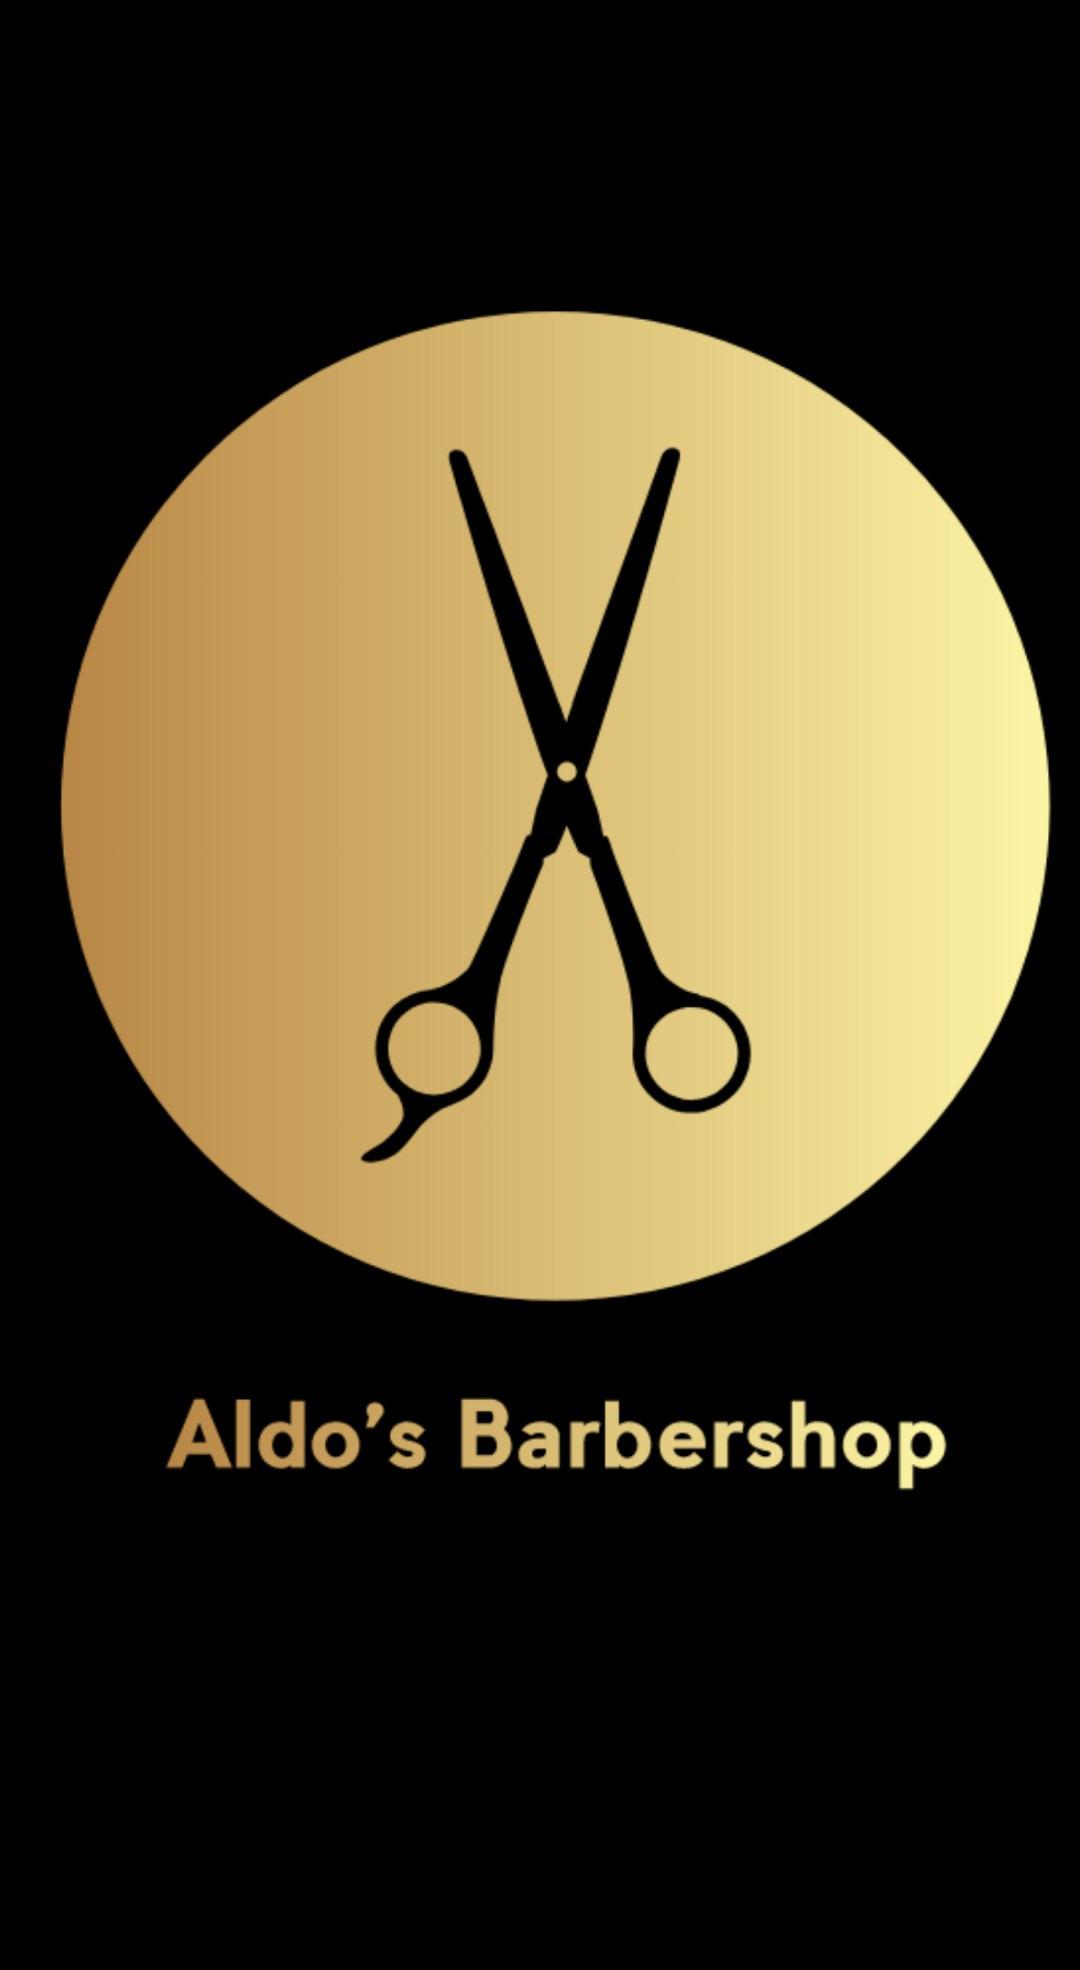 Aldo's Barbershop